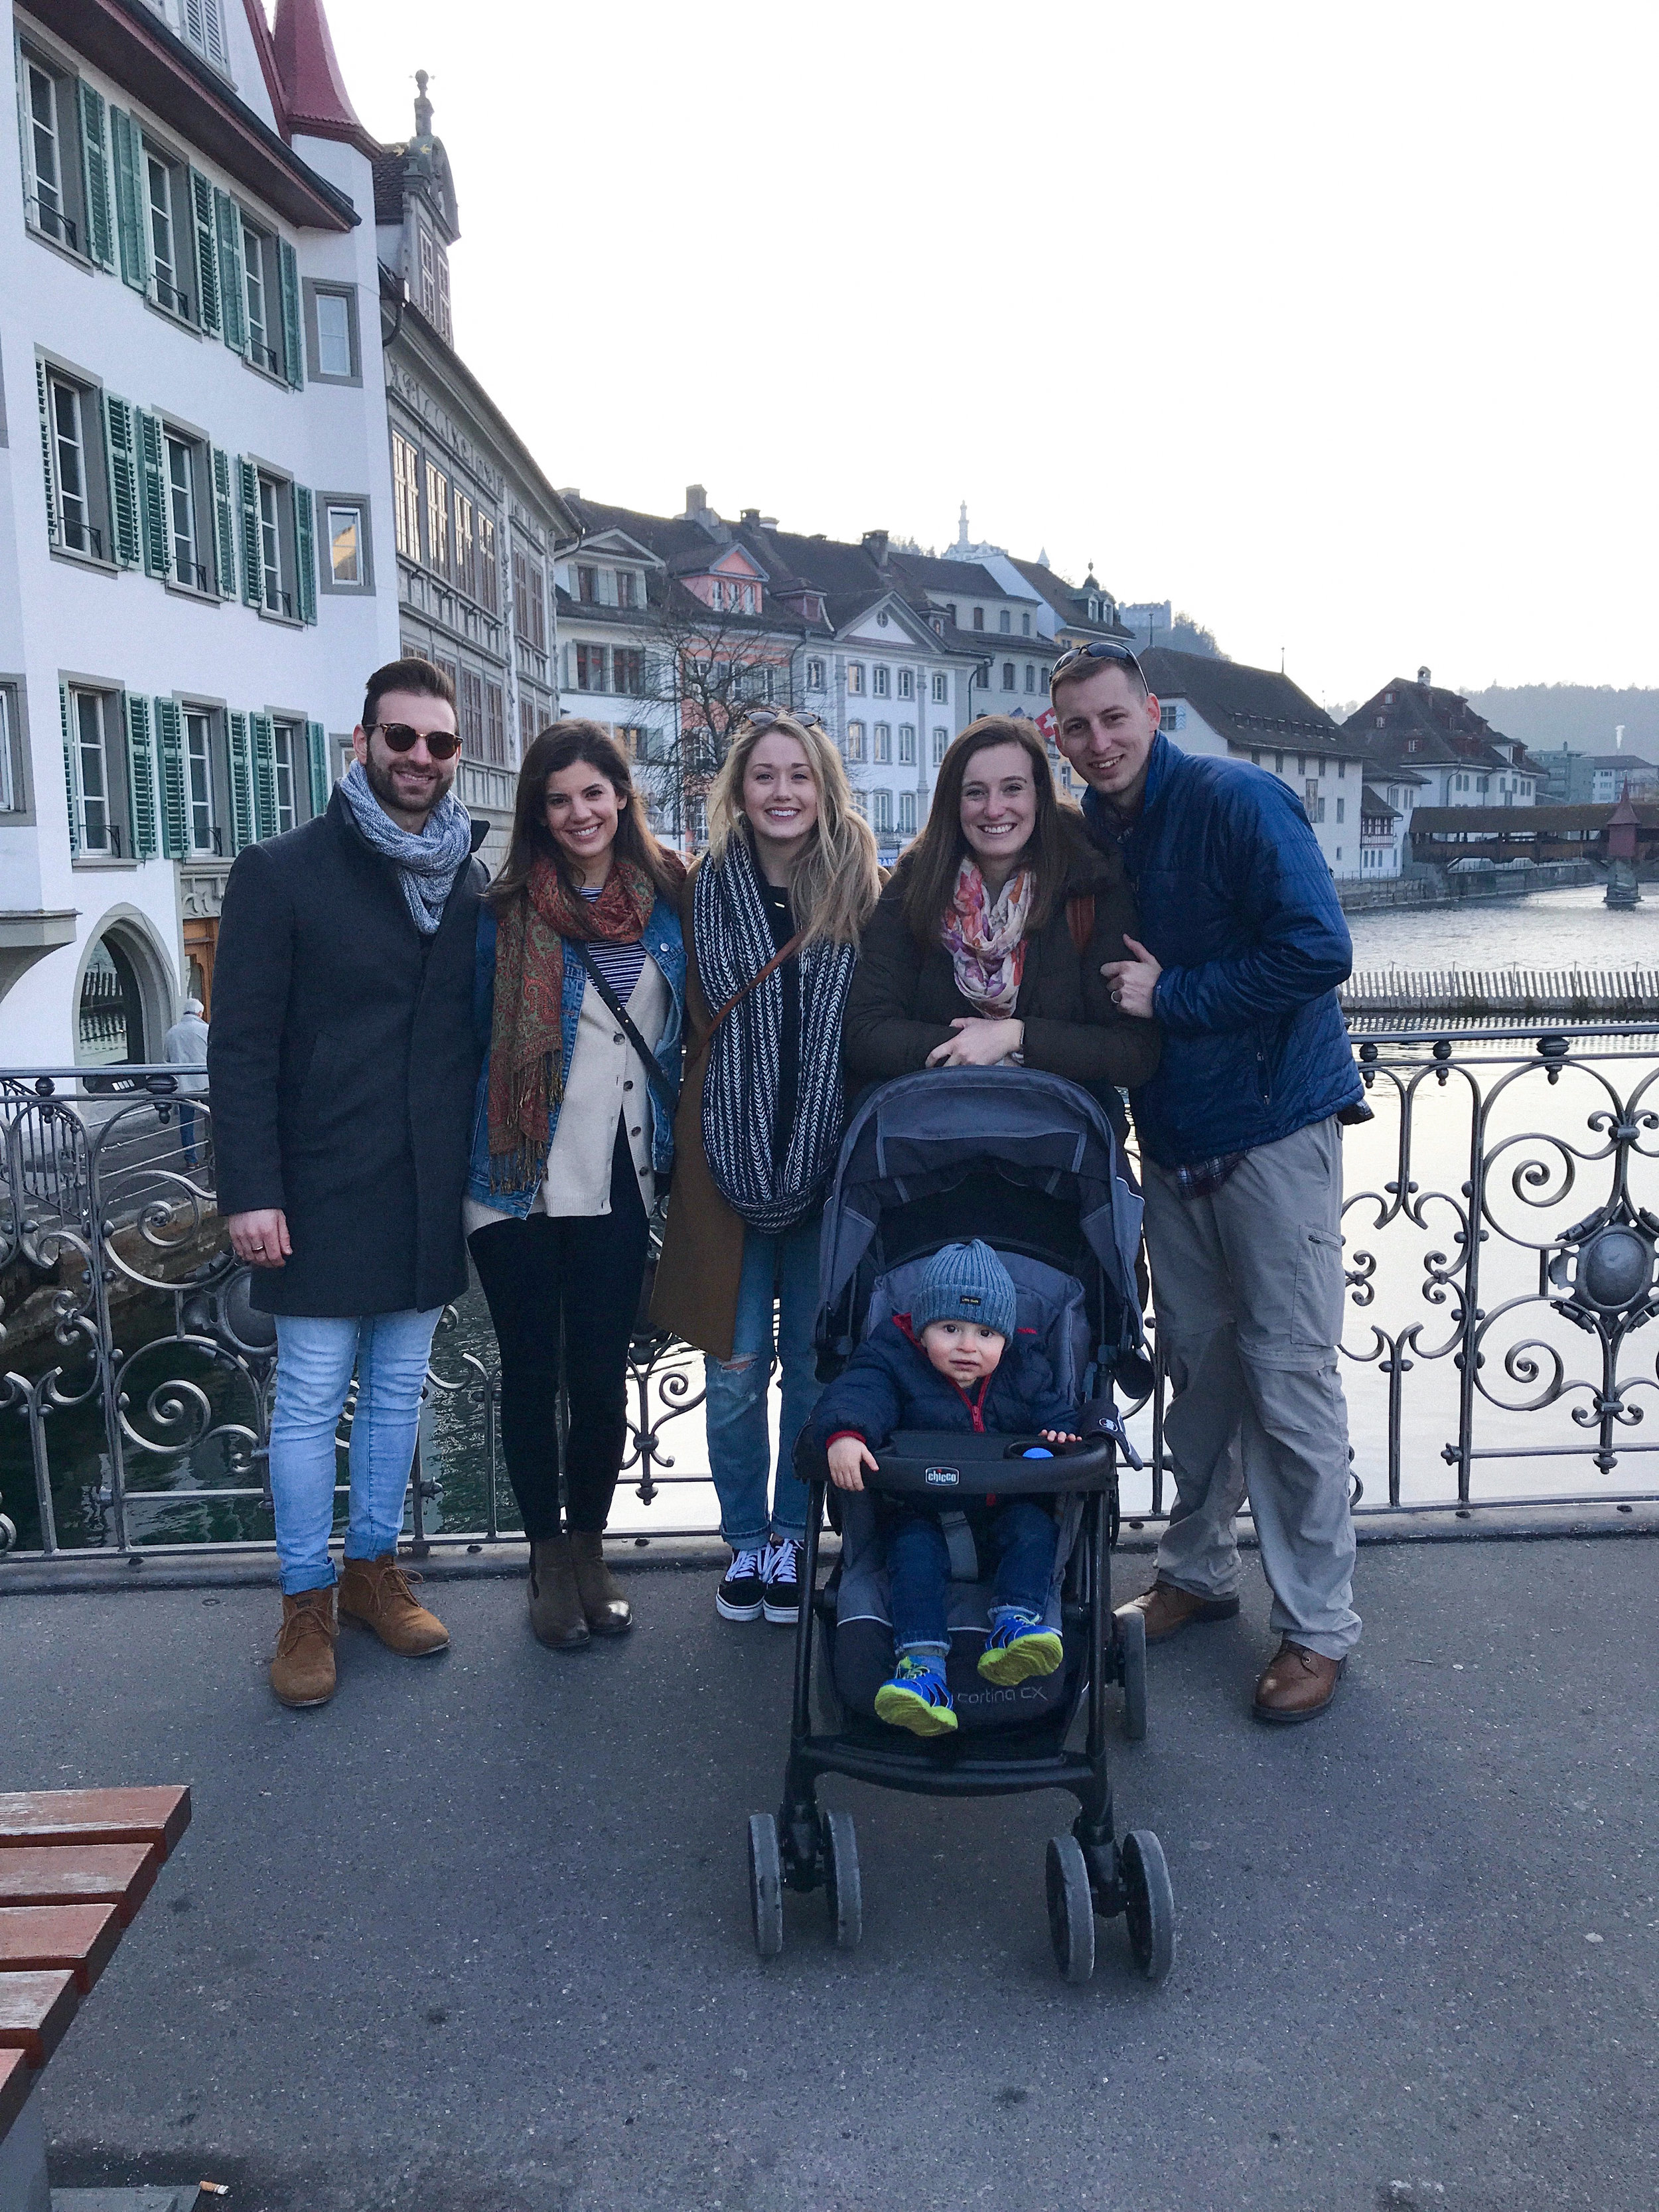 Sightseeing in Lucerne | Kaci Nicole.jpg